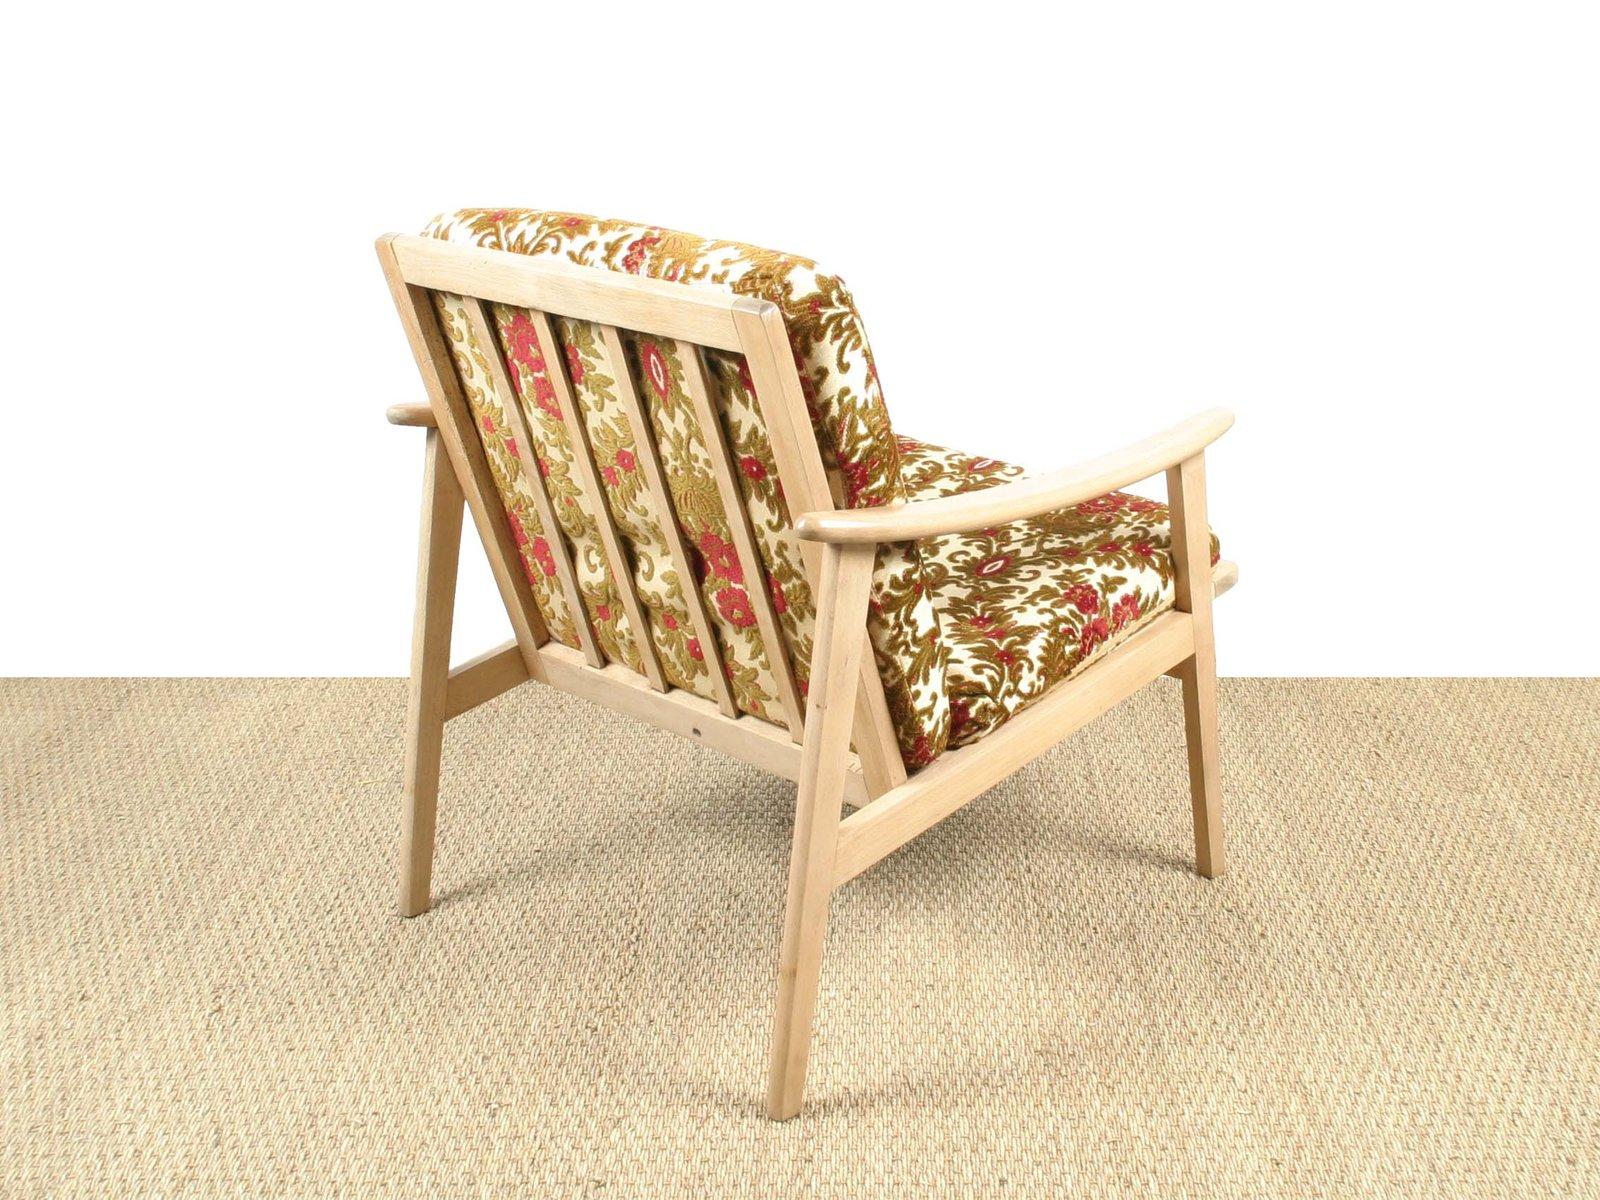 franz sischer sessel aus hellem holz 1960er bei pamono kaufen. Black Bedroom Furniture Sets. Home Design Ideas